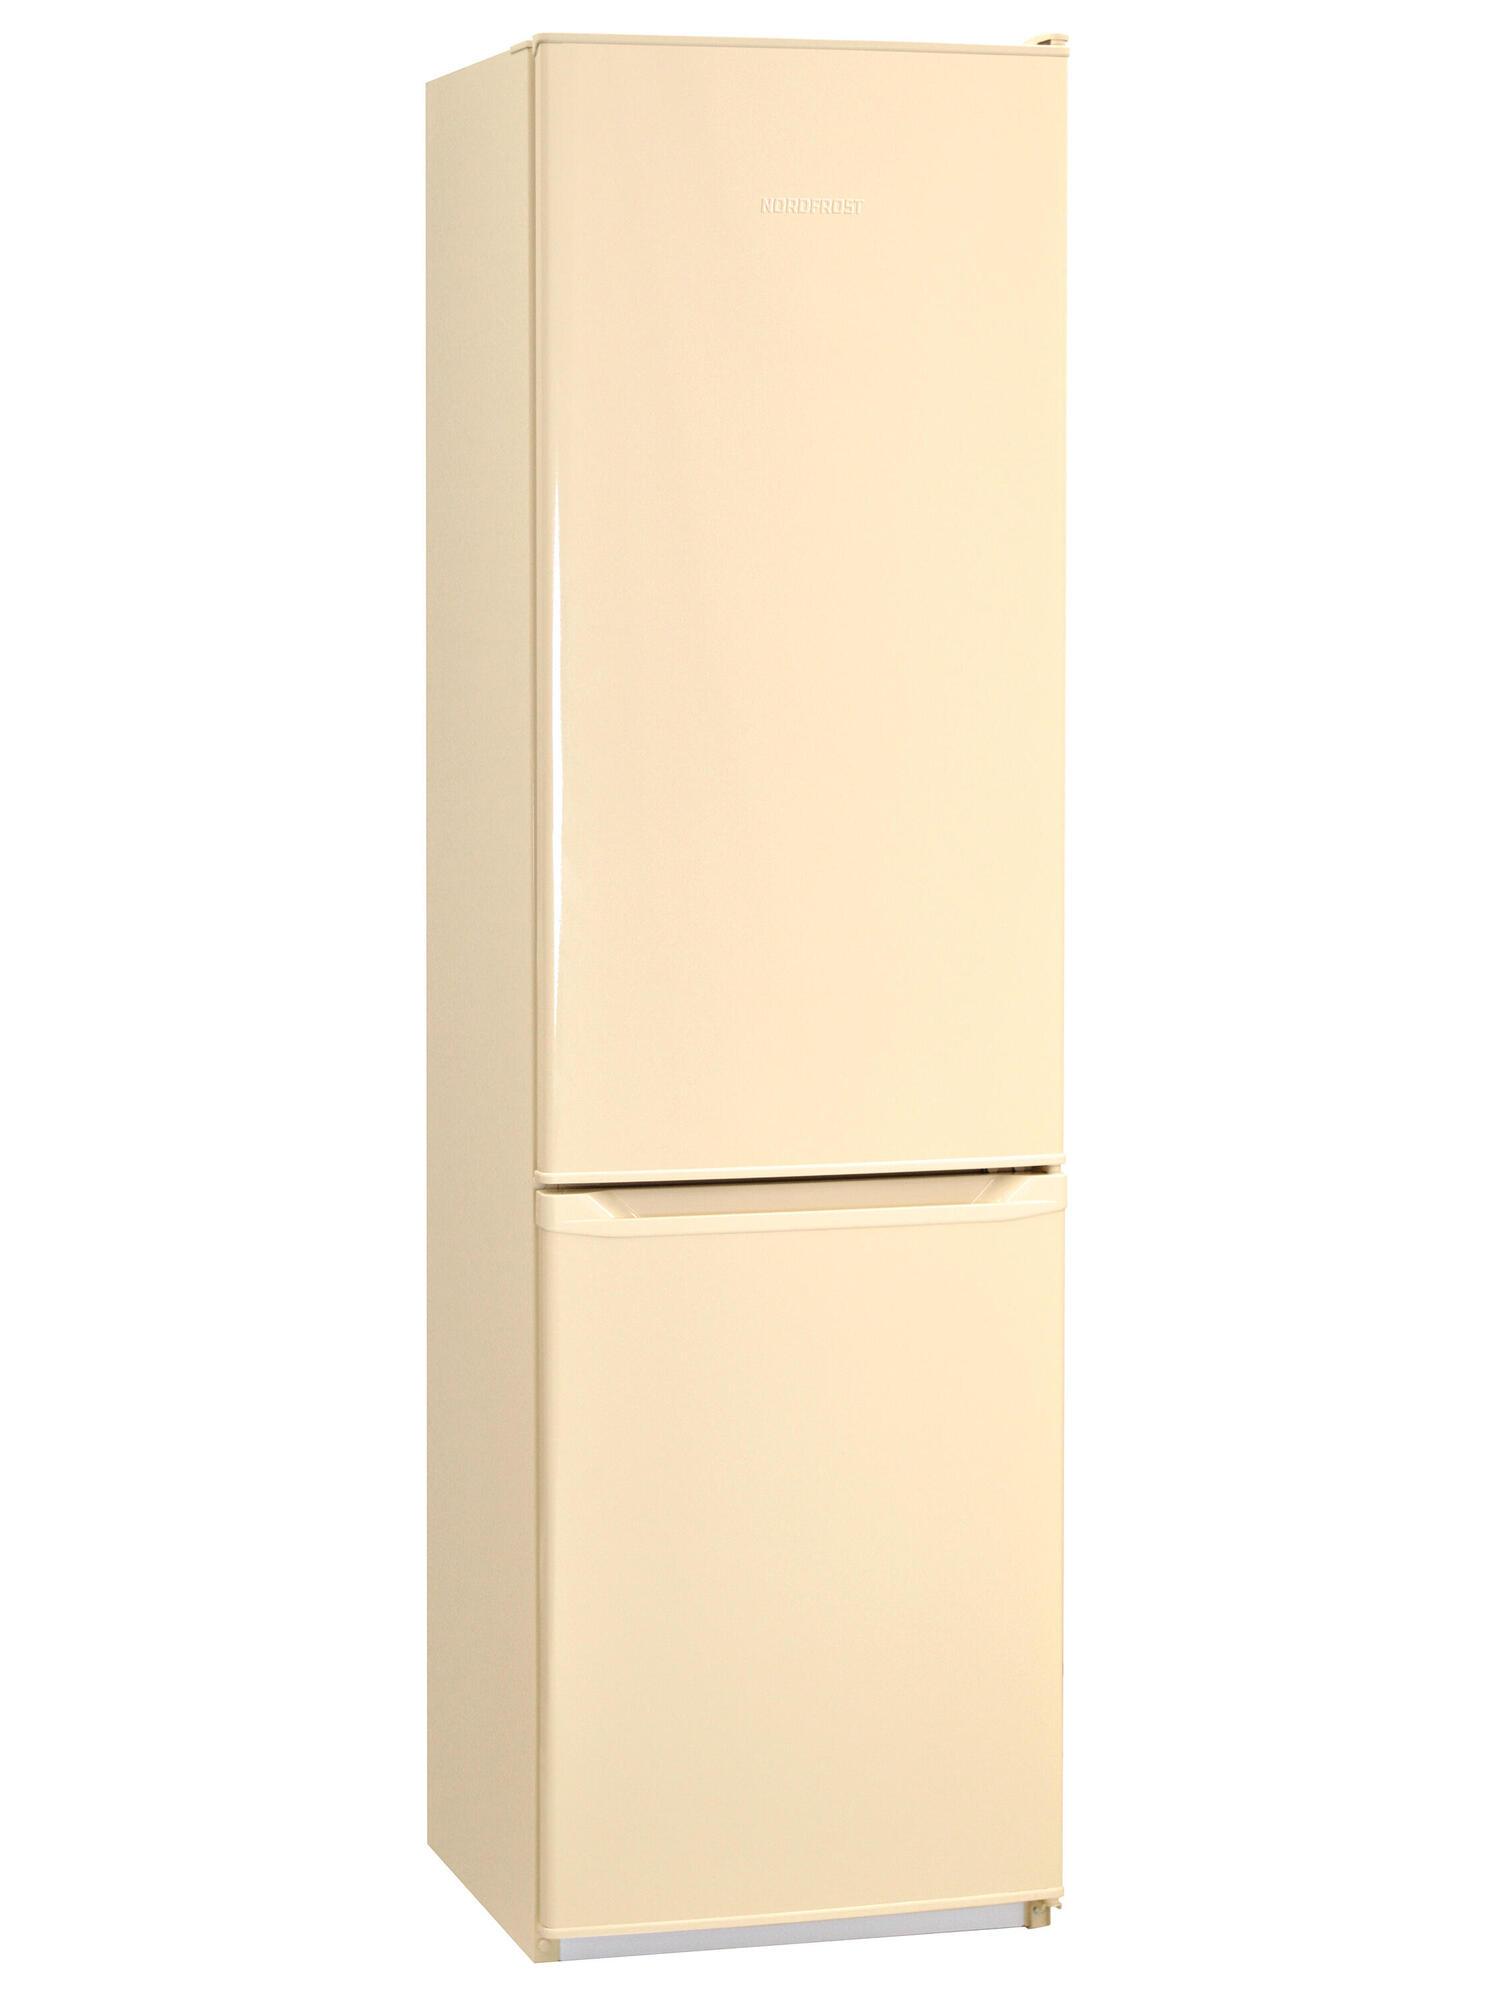 Холодильник NORDFROST NRB 154-732